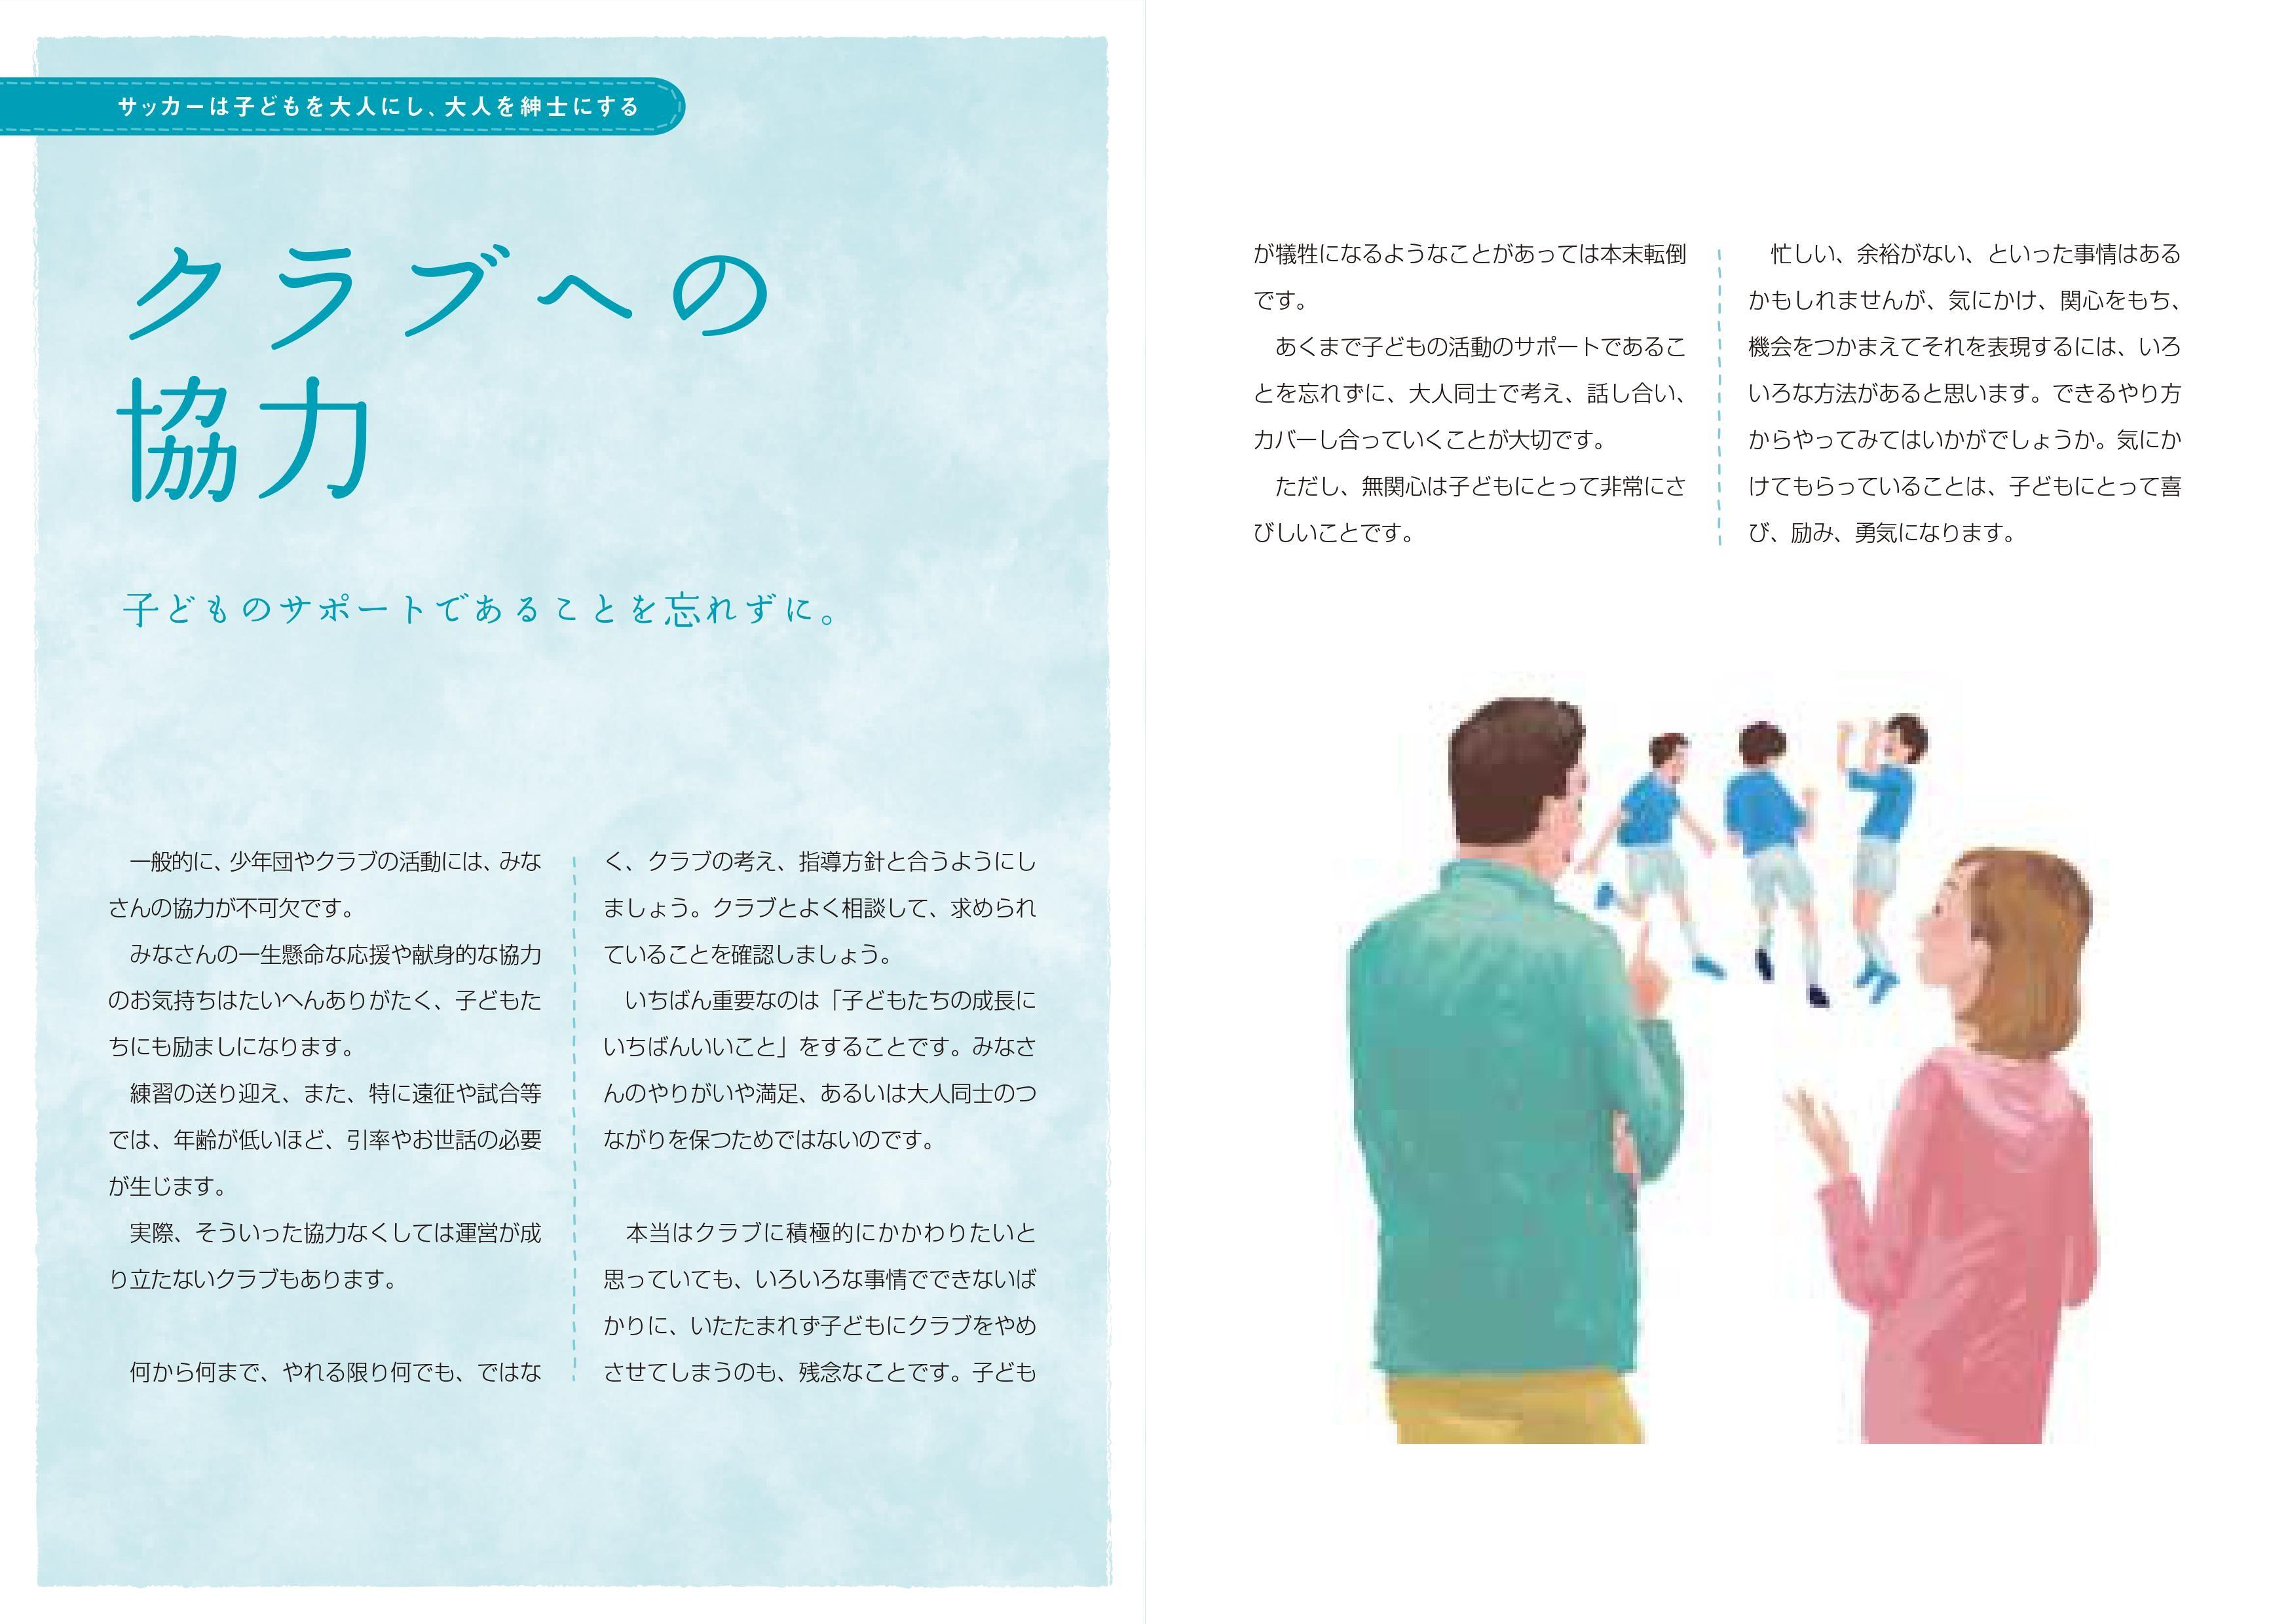 JFA handbook _03